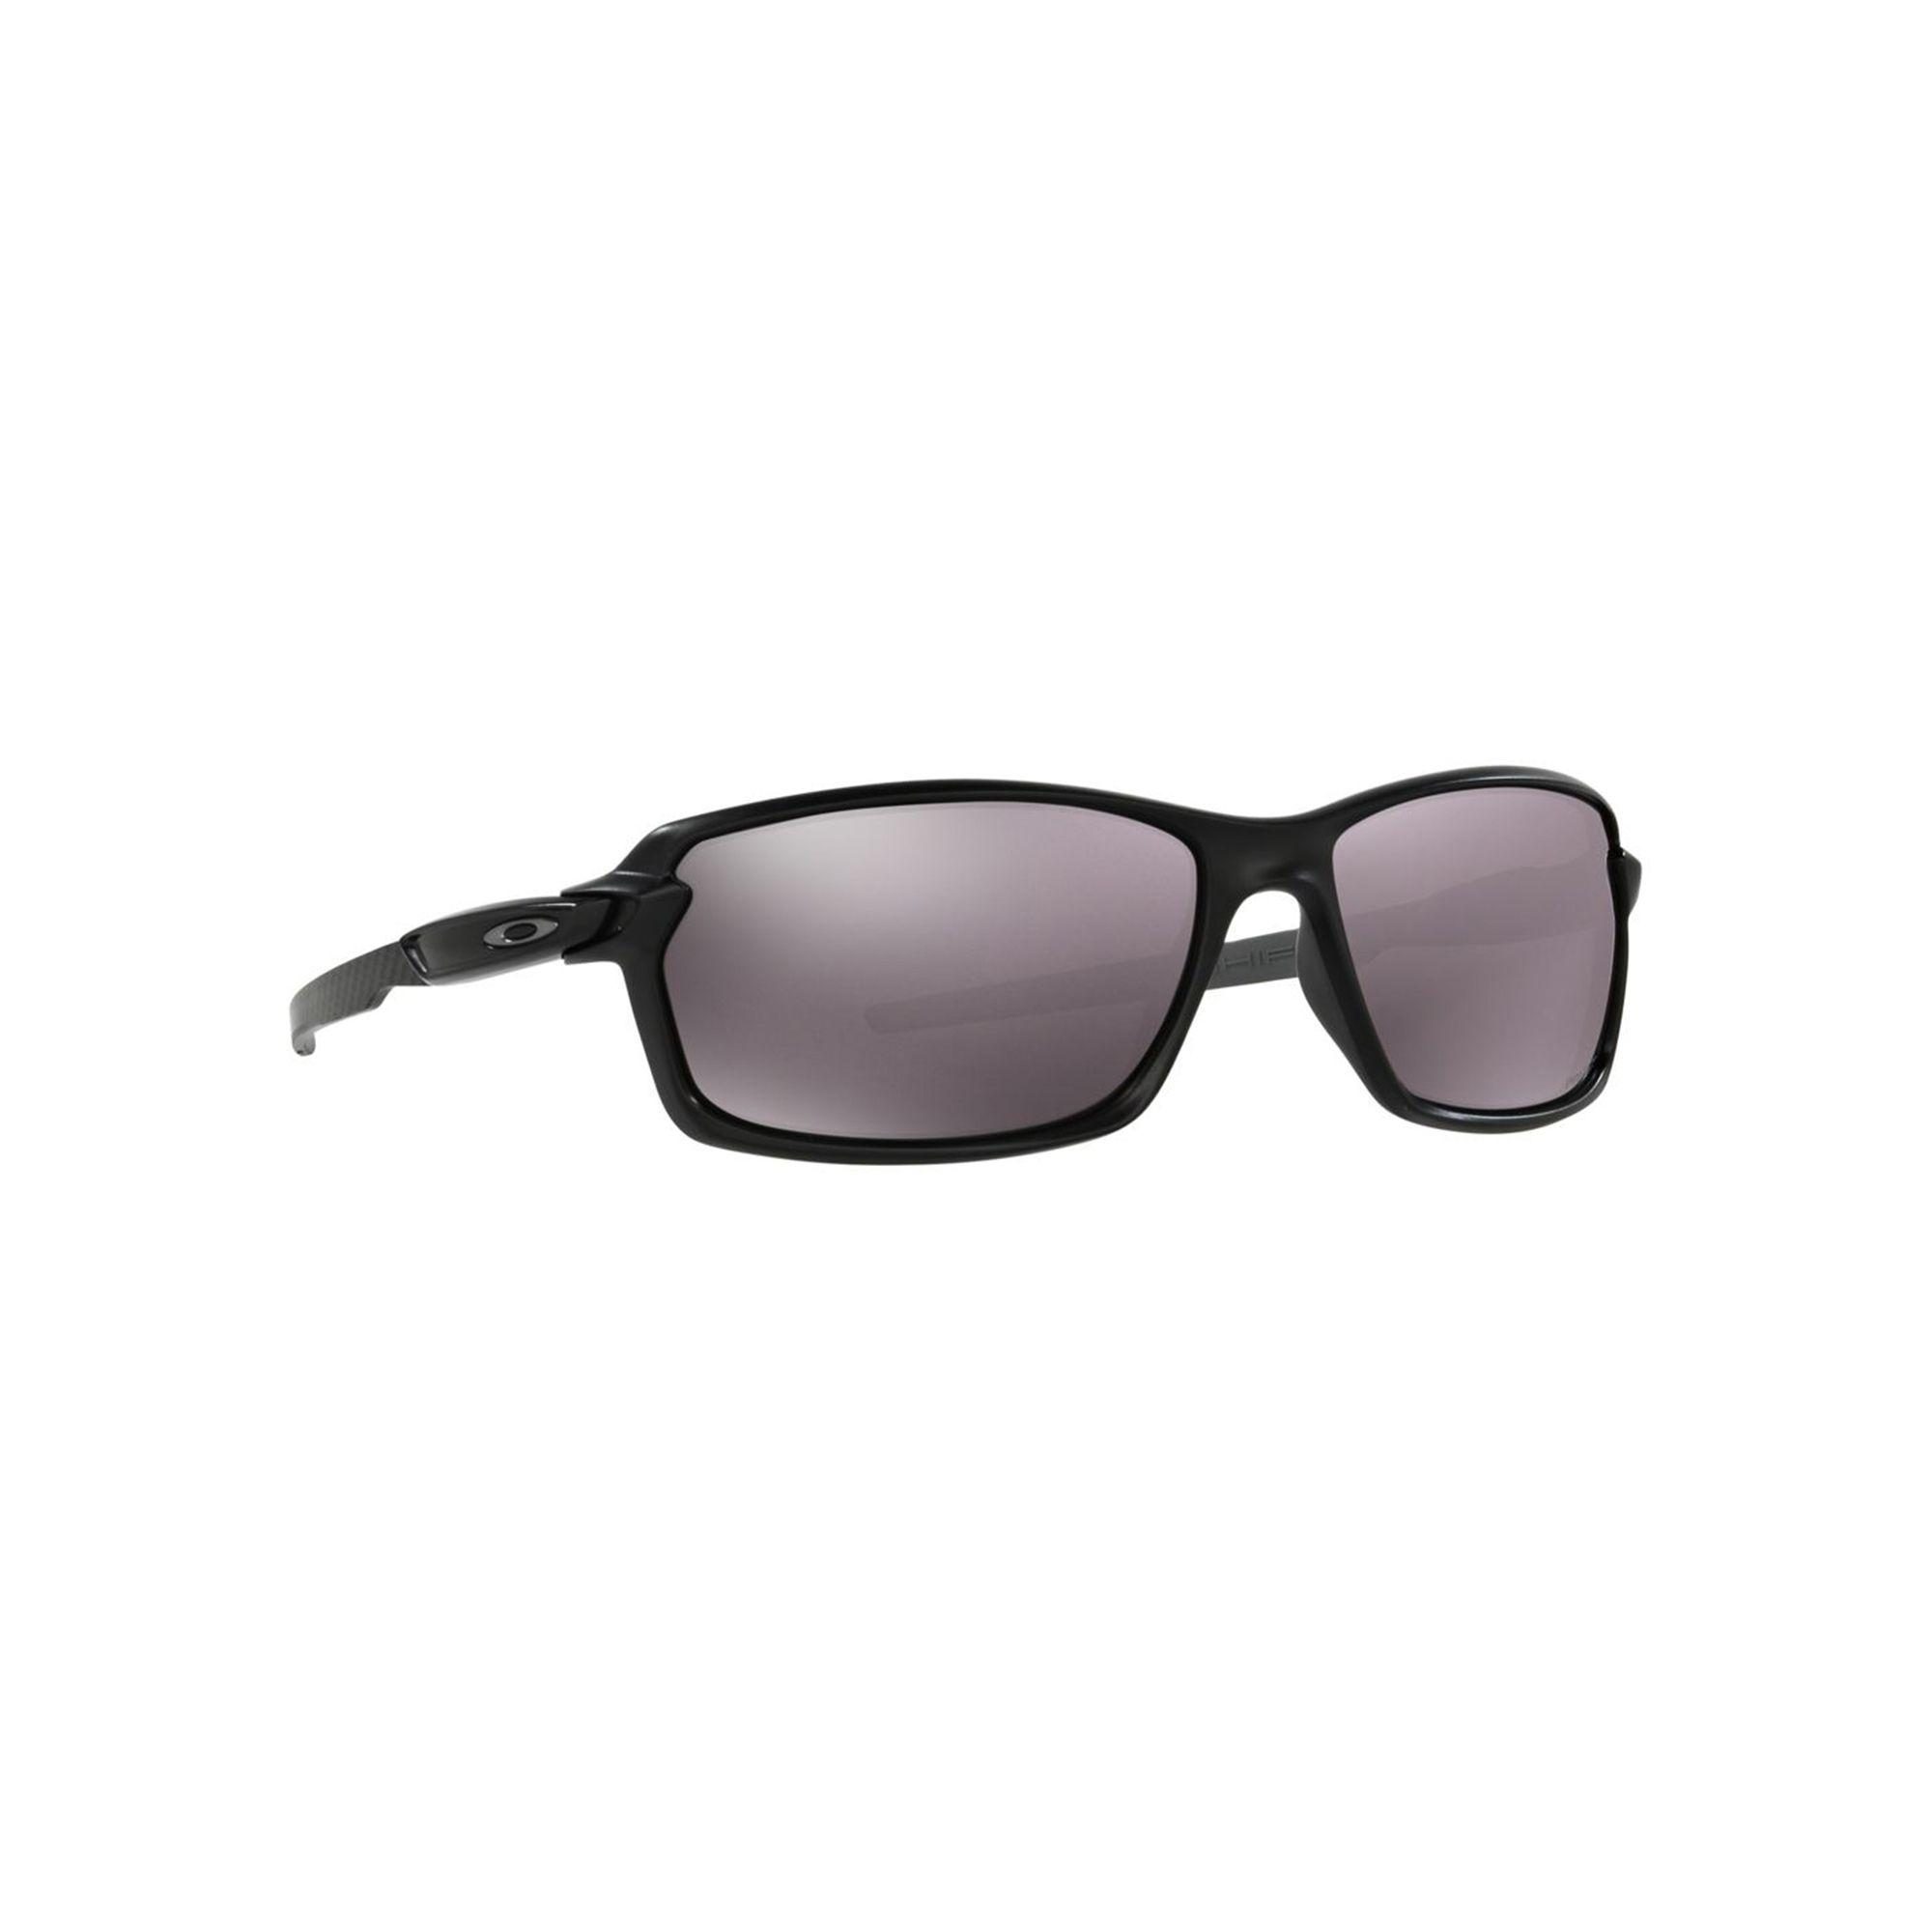 c3643c72e09 Lyst - Oakley Matte Black  carbon Shift  Oo9302 Rectangle Sunglasses ...